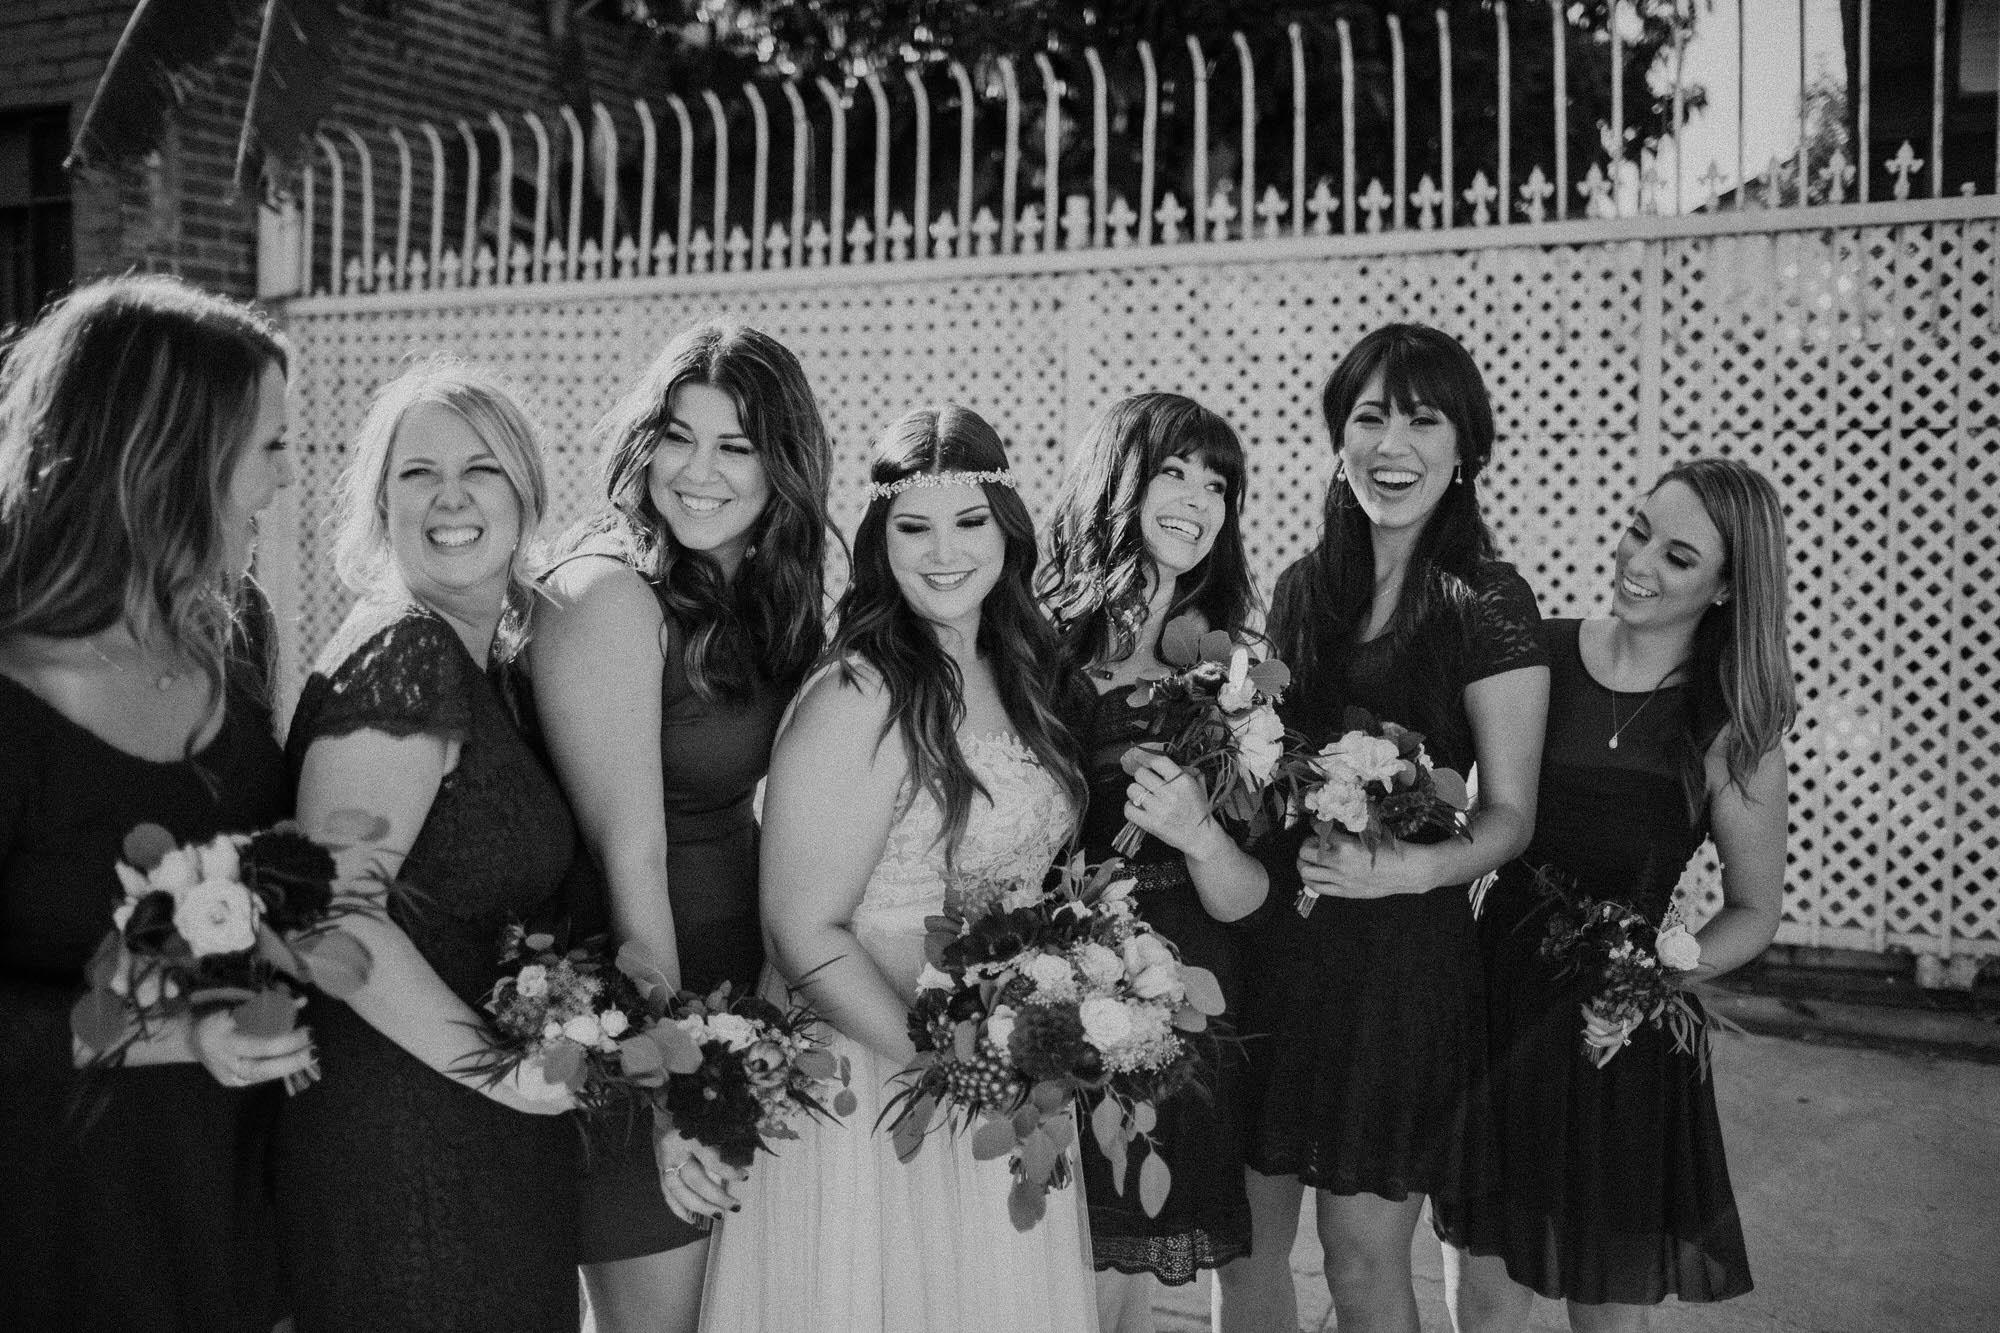 los-angeles-wedding-photographer-kristen-dylan-53.jpg